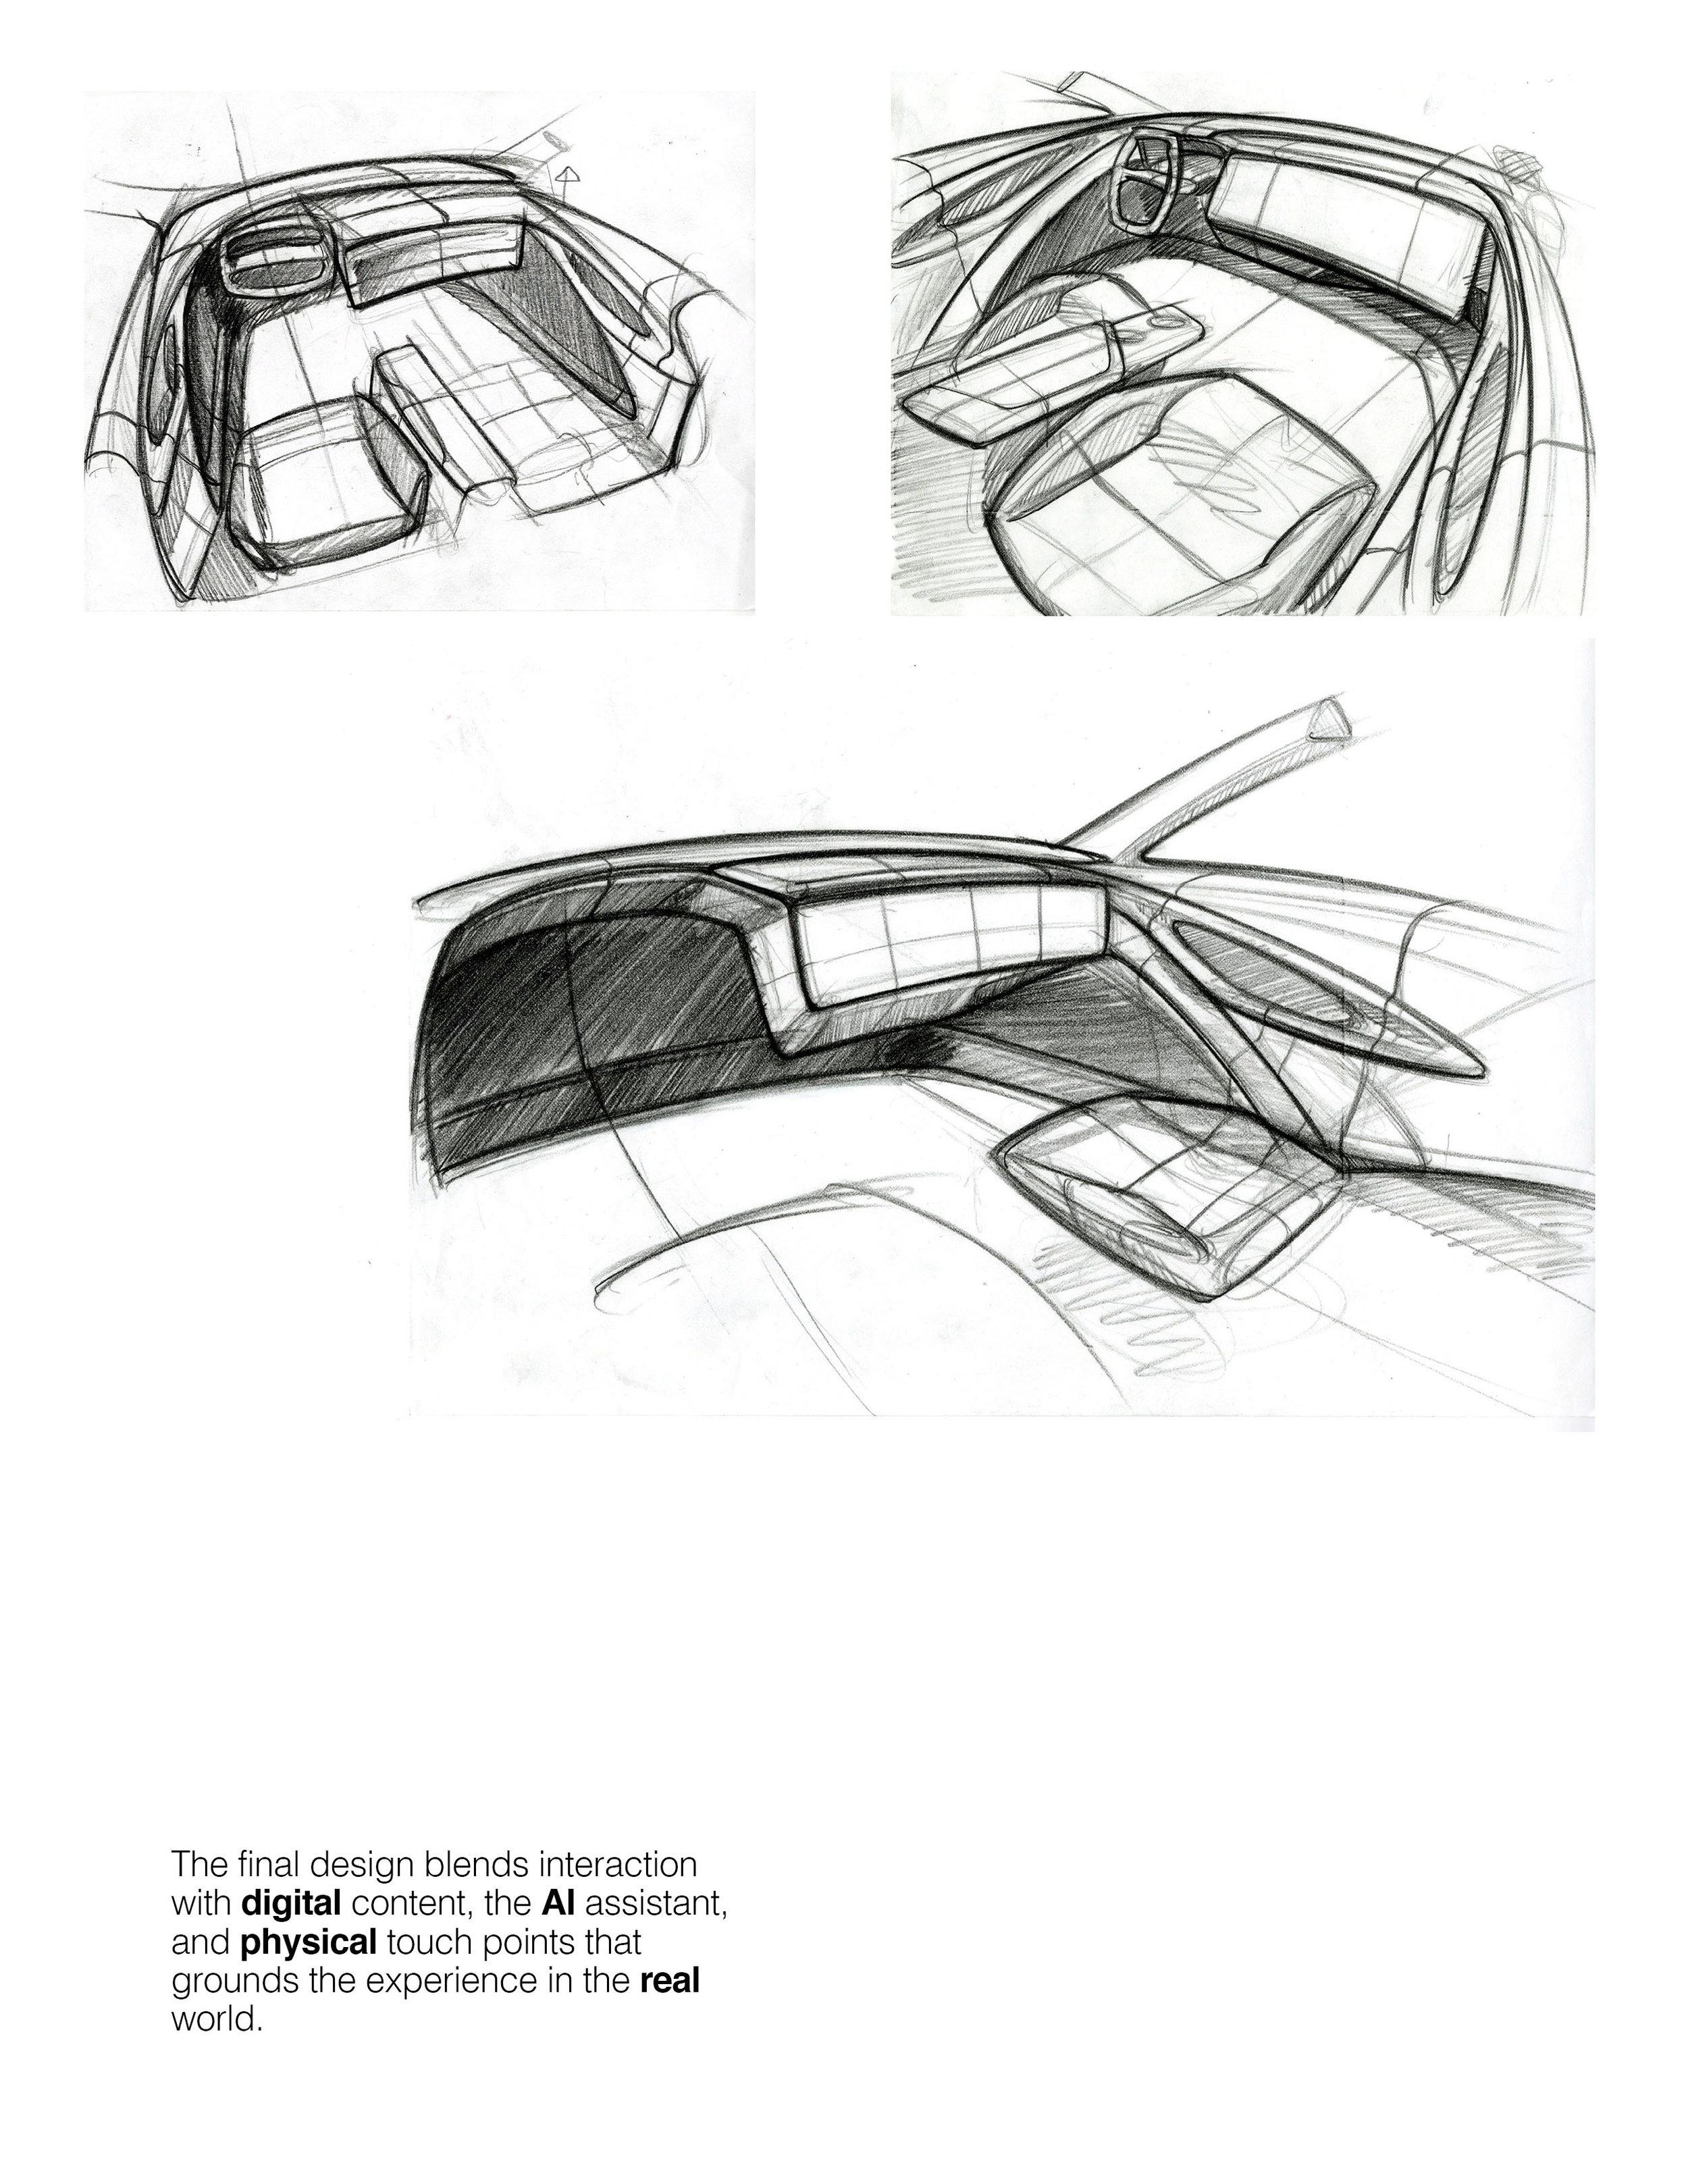 SamsungProjectArtboard 1 copy 4.jpg